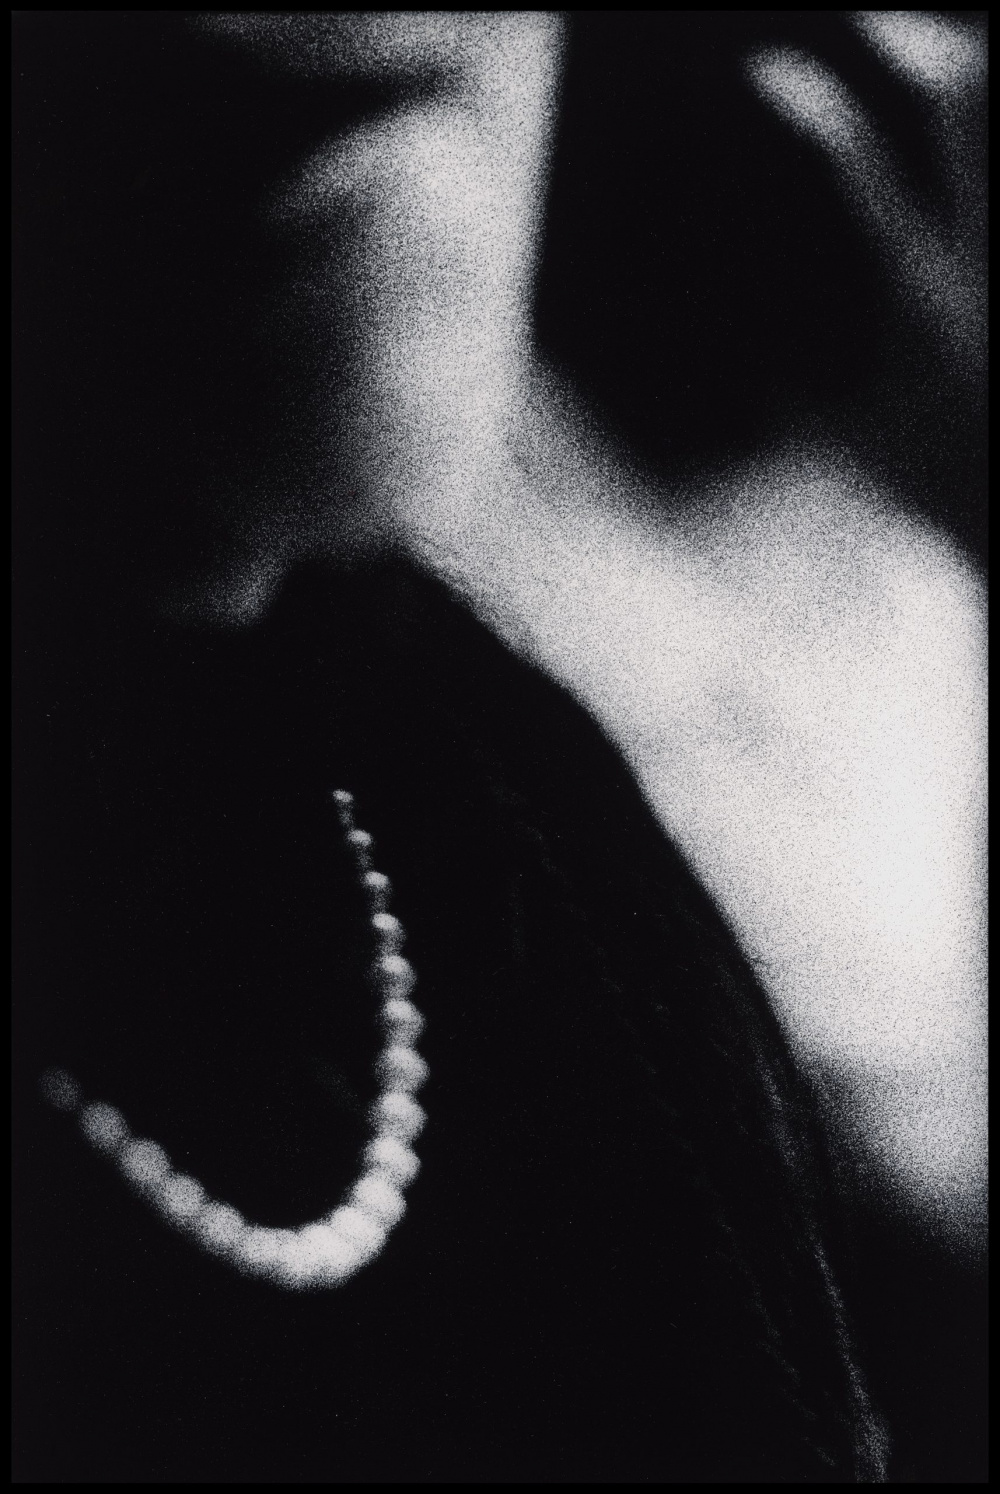 Saman Genshin, Woman With Pearls, 2019